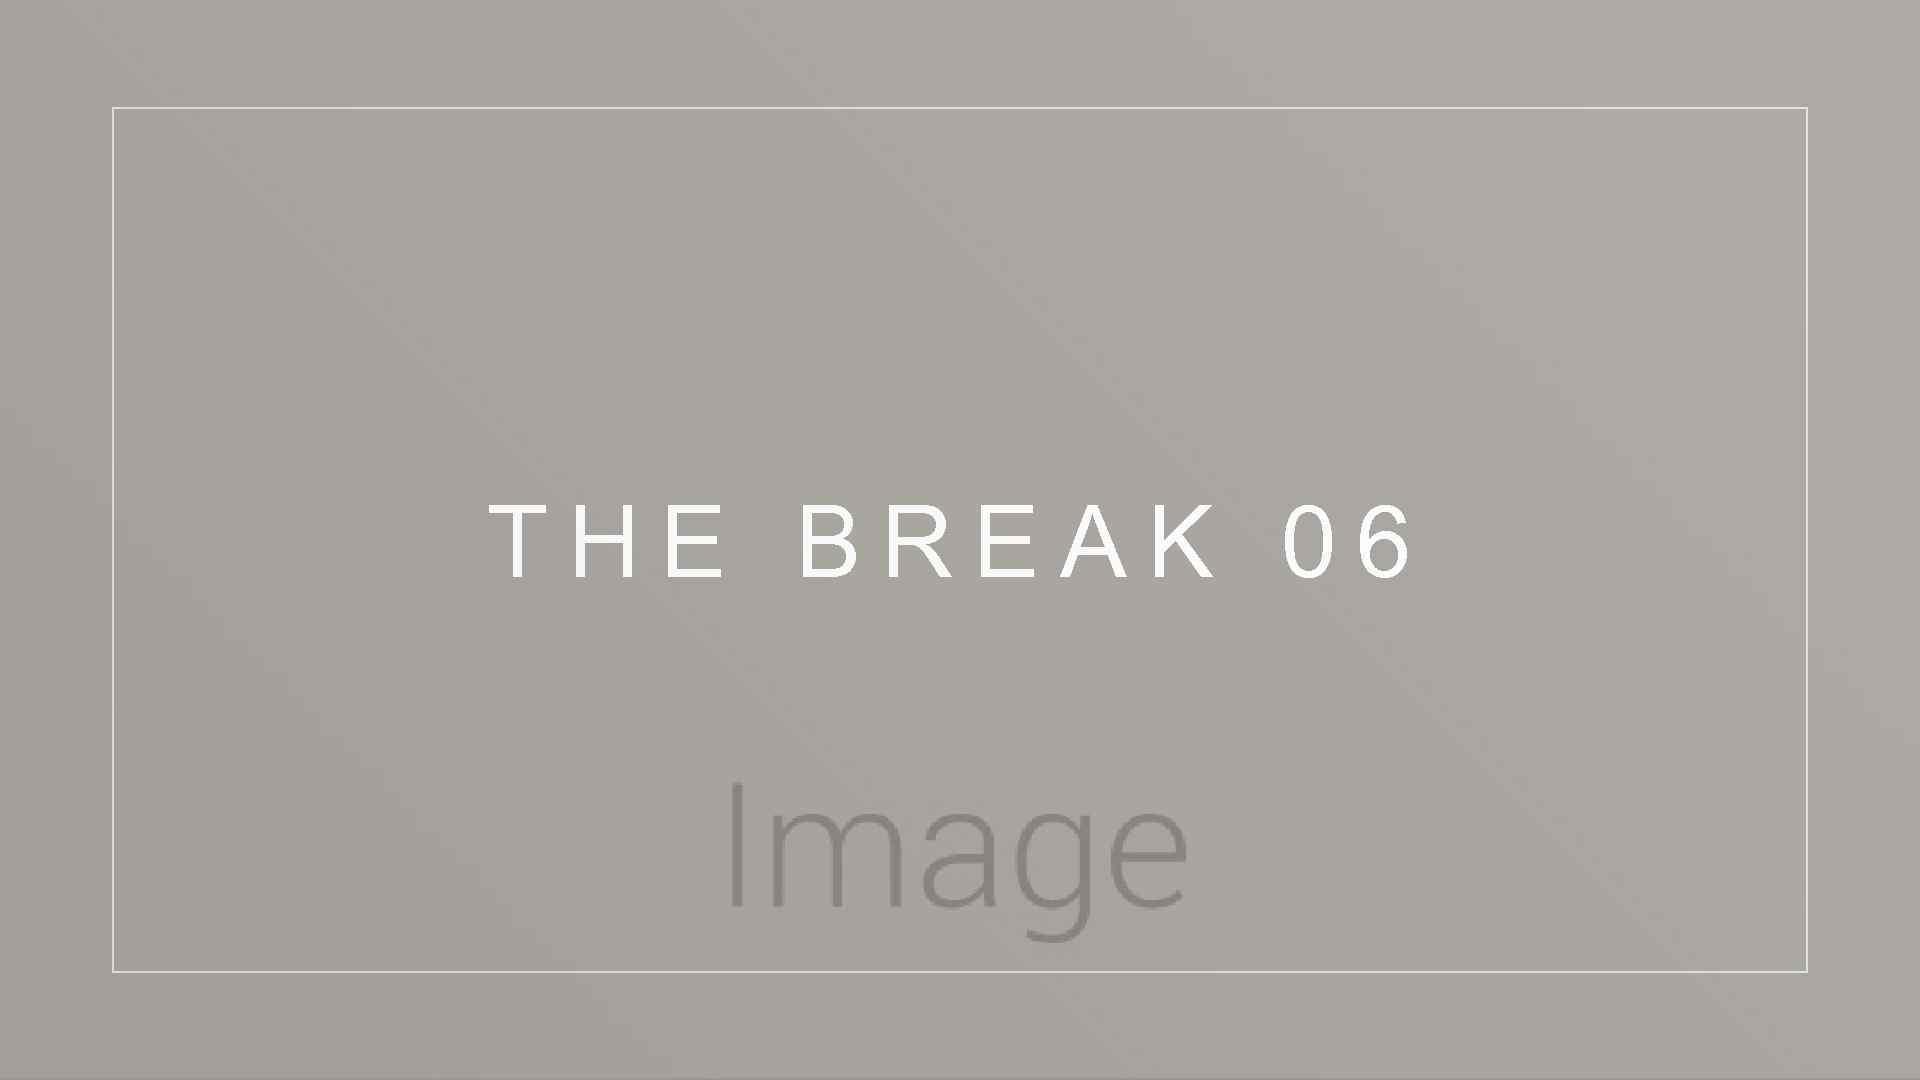 THE BREAK 06